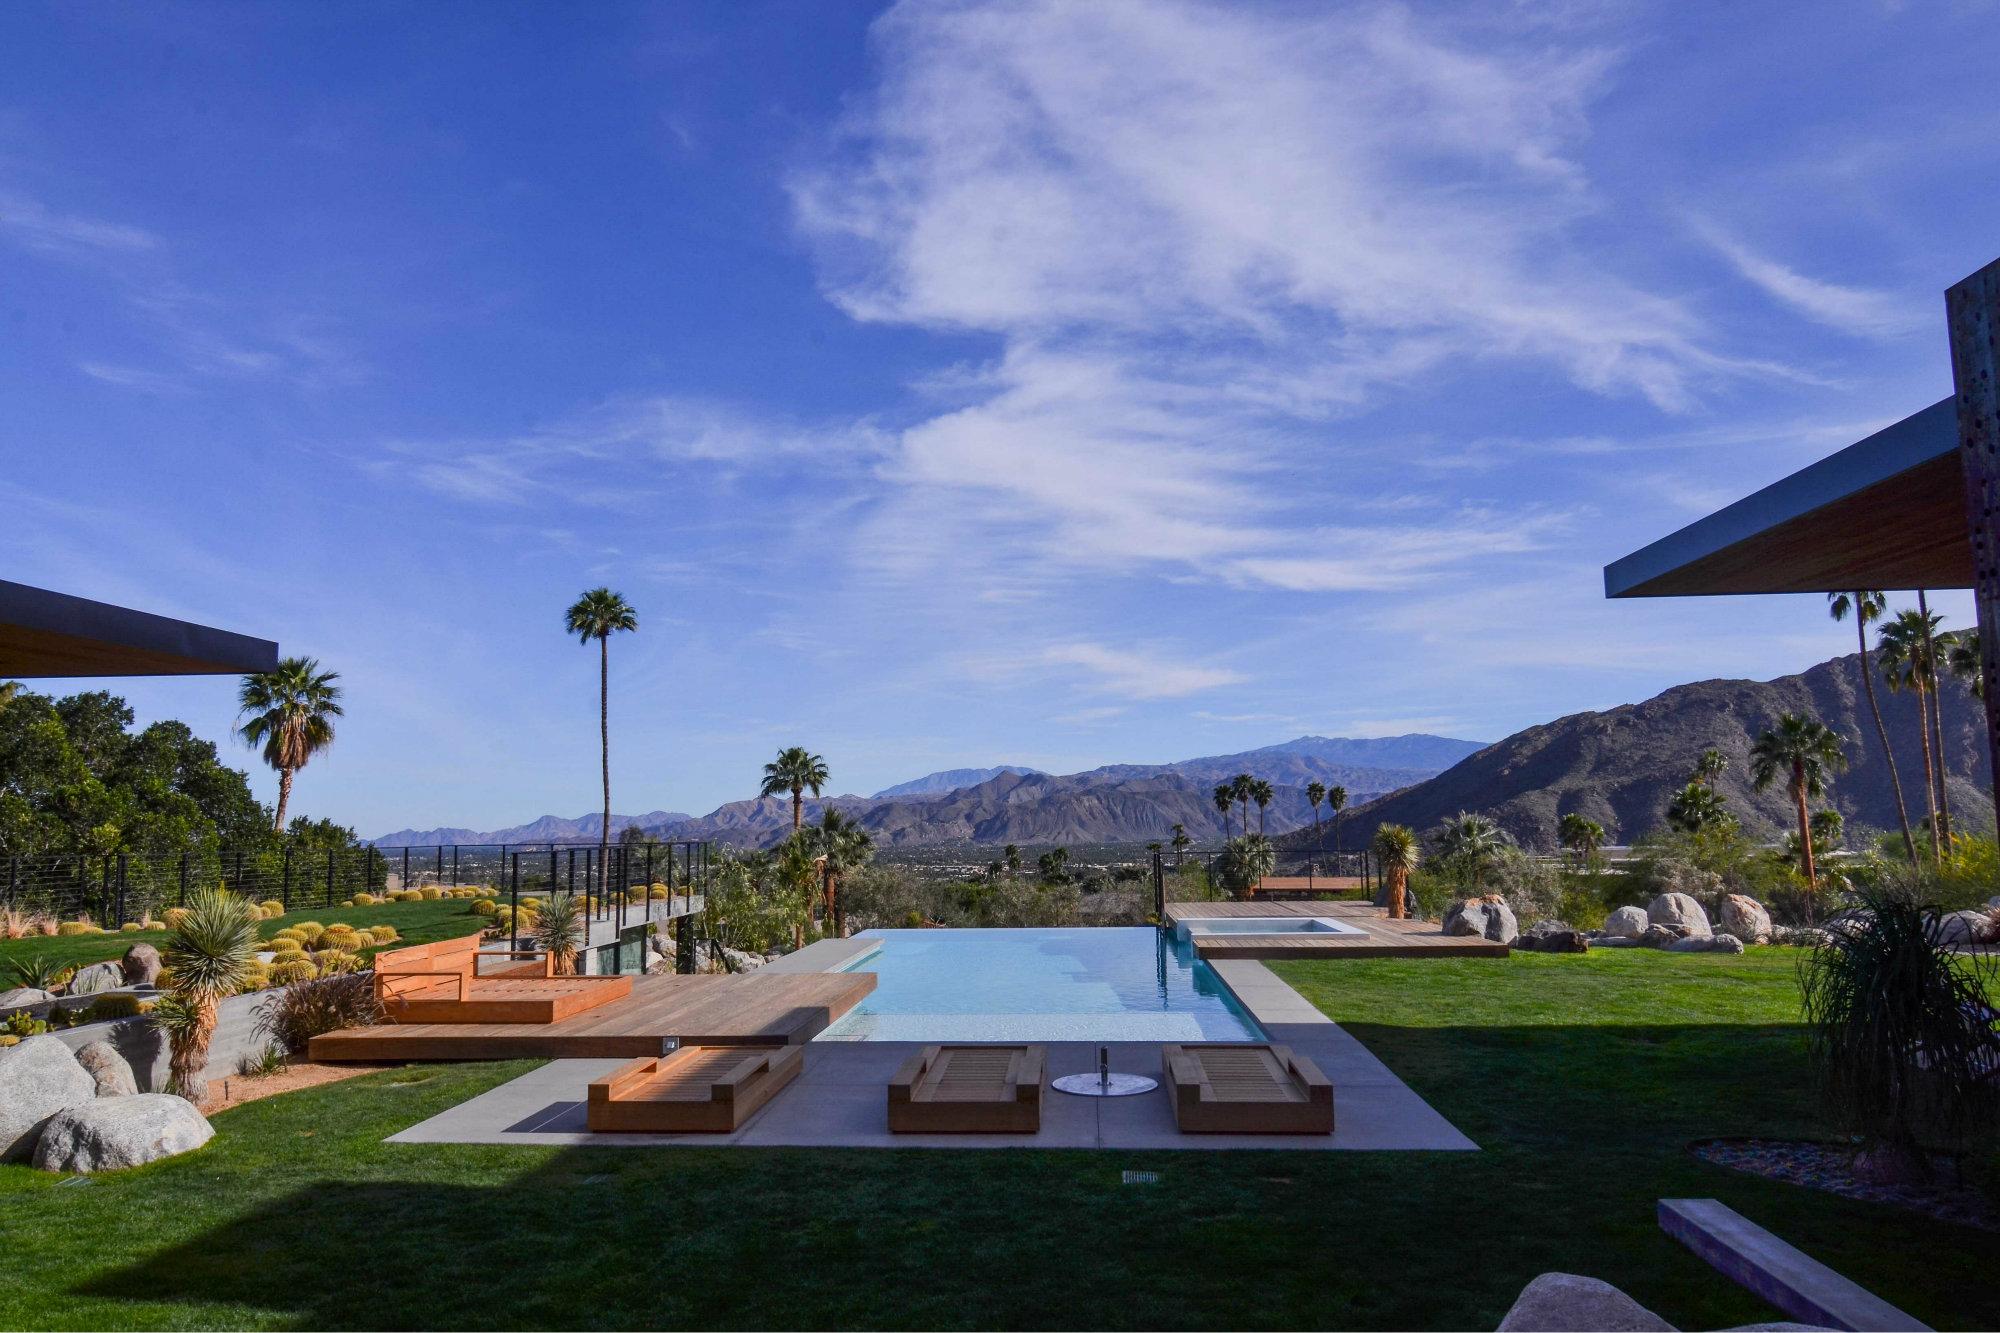 Modern outlook pool spa news design pools award for Pool design 2016